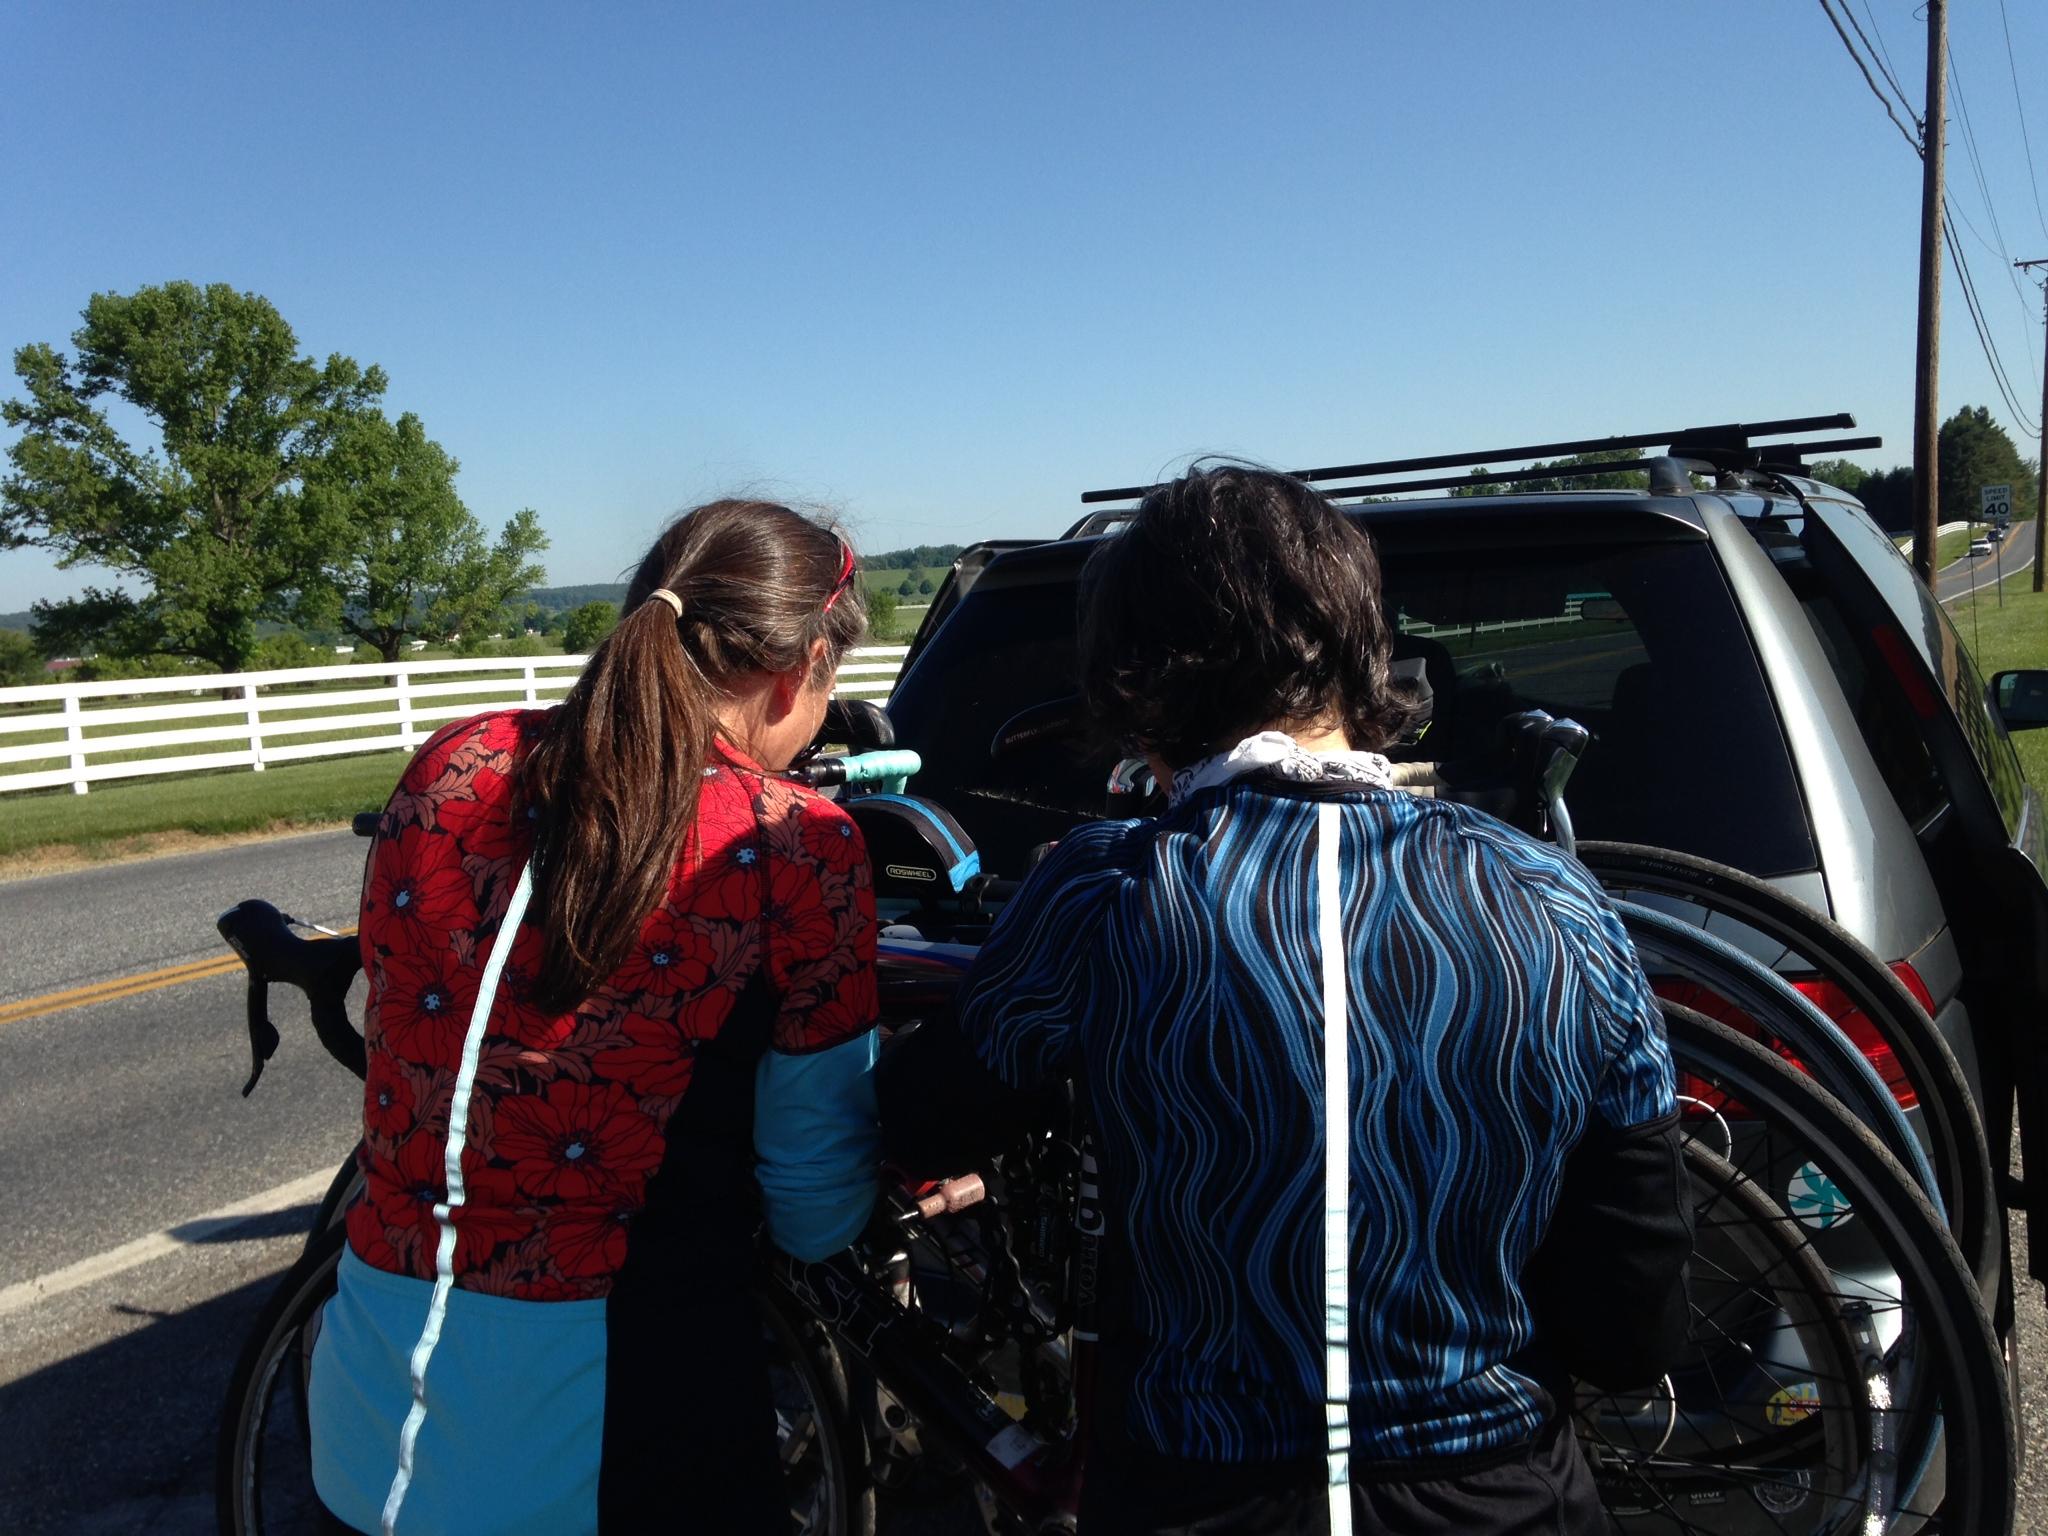 Women wearing cycling jerseys with reflective stripe on back